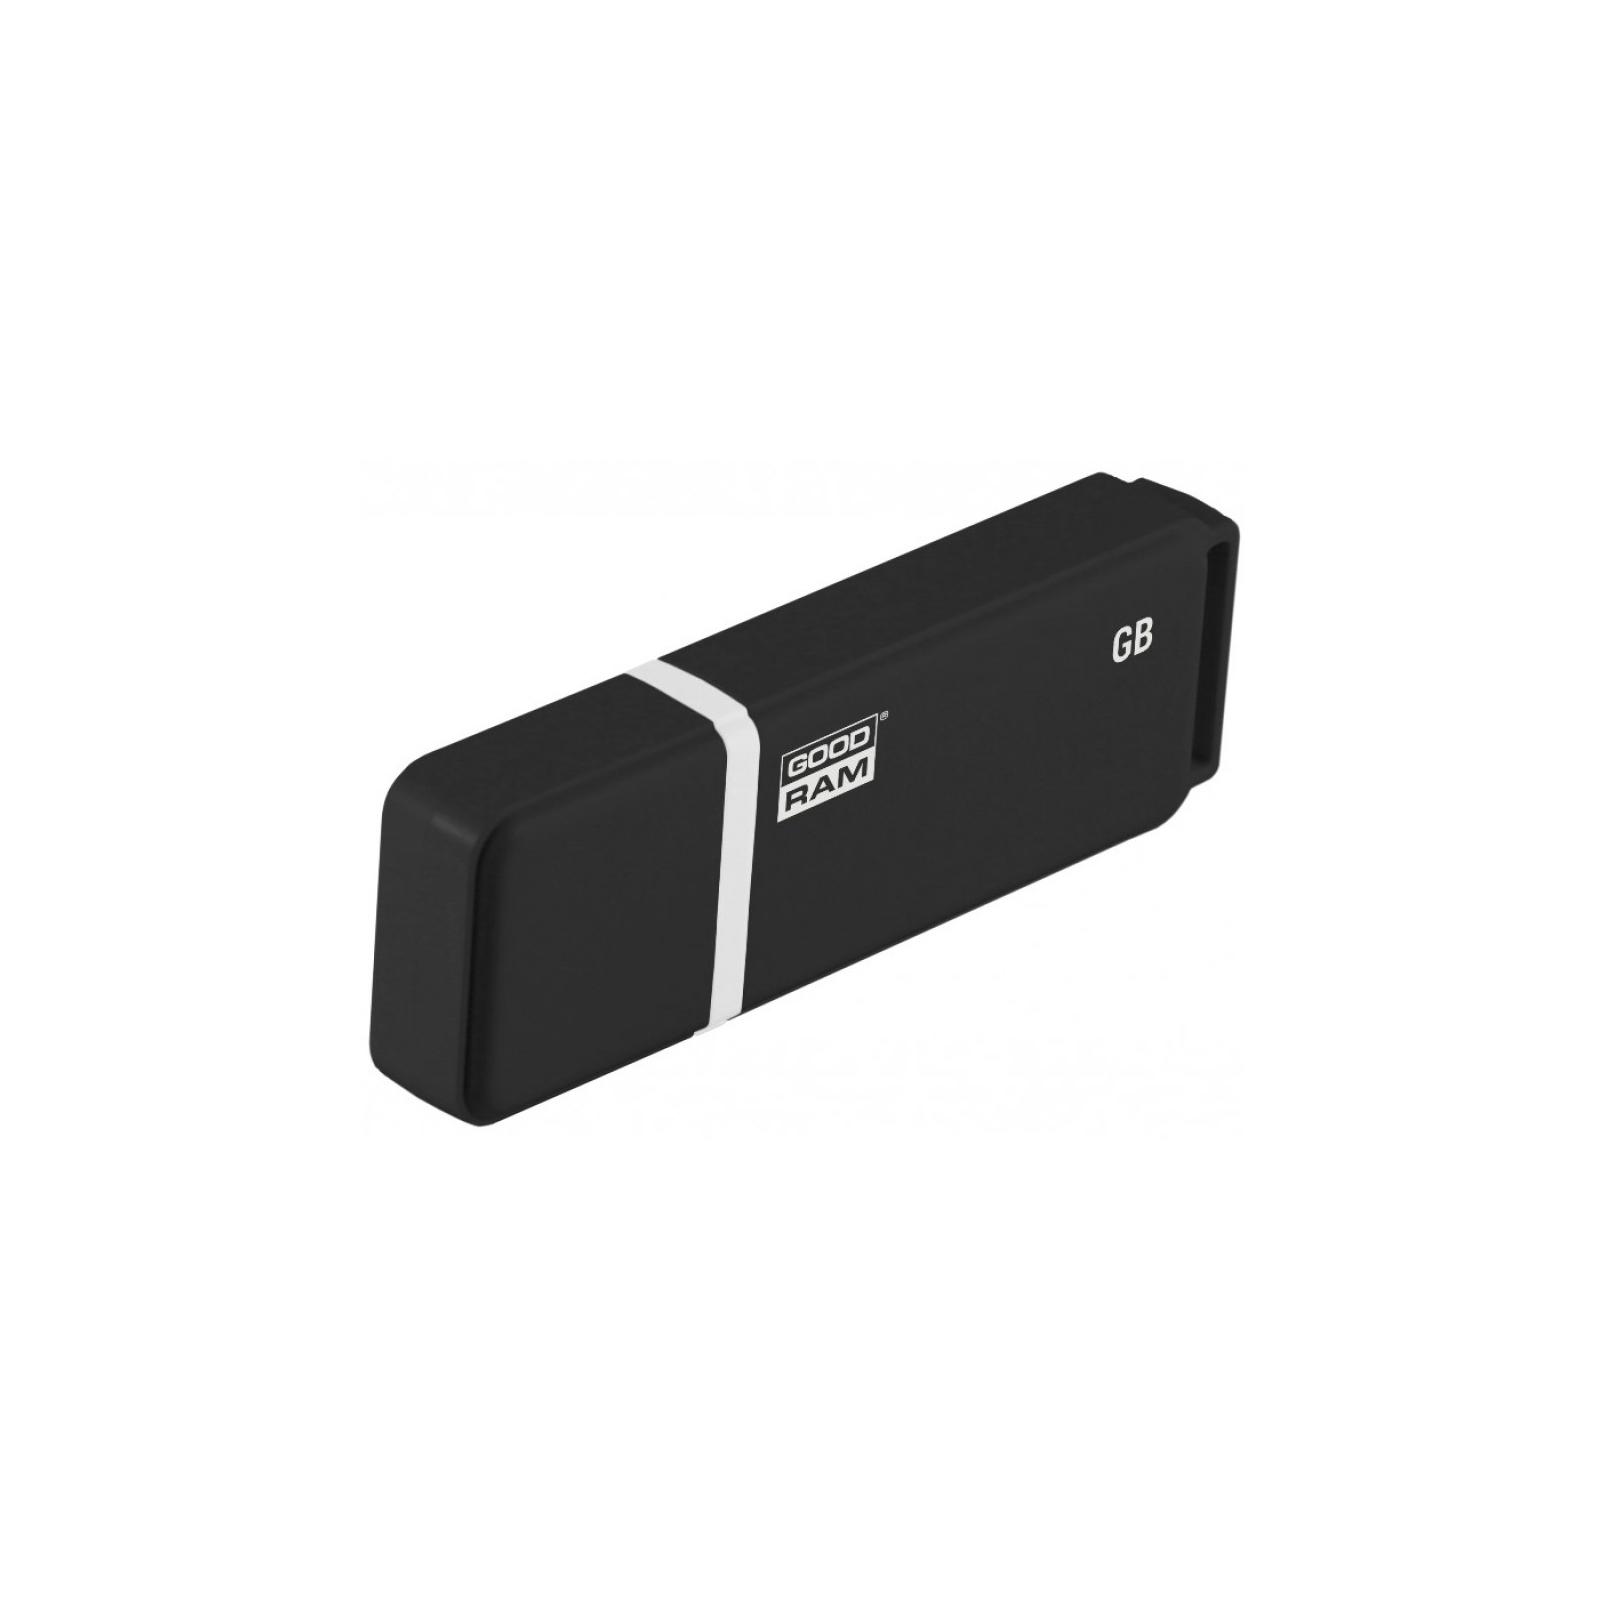 USB флеш накопитель Goodram 8GB UMO2 Green USB 2.0 (UMO2-0080G0R11) изображение 2